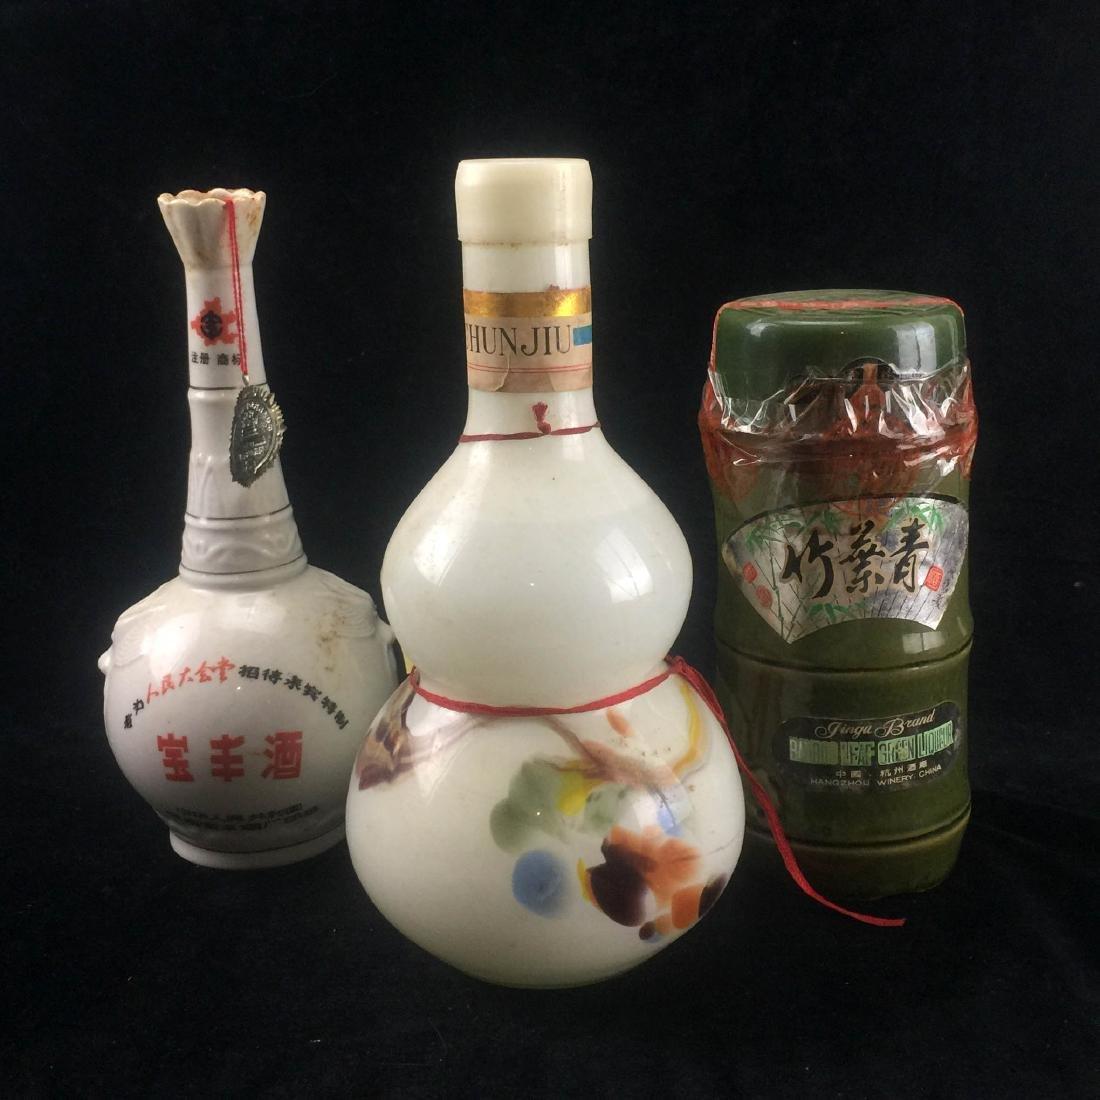 Three Old Chinese Liquor: Celebratory Liquor and Bamboo